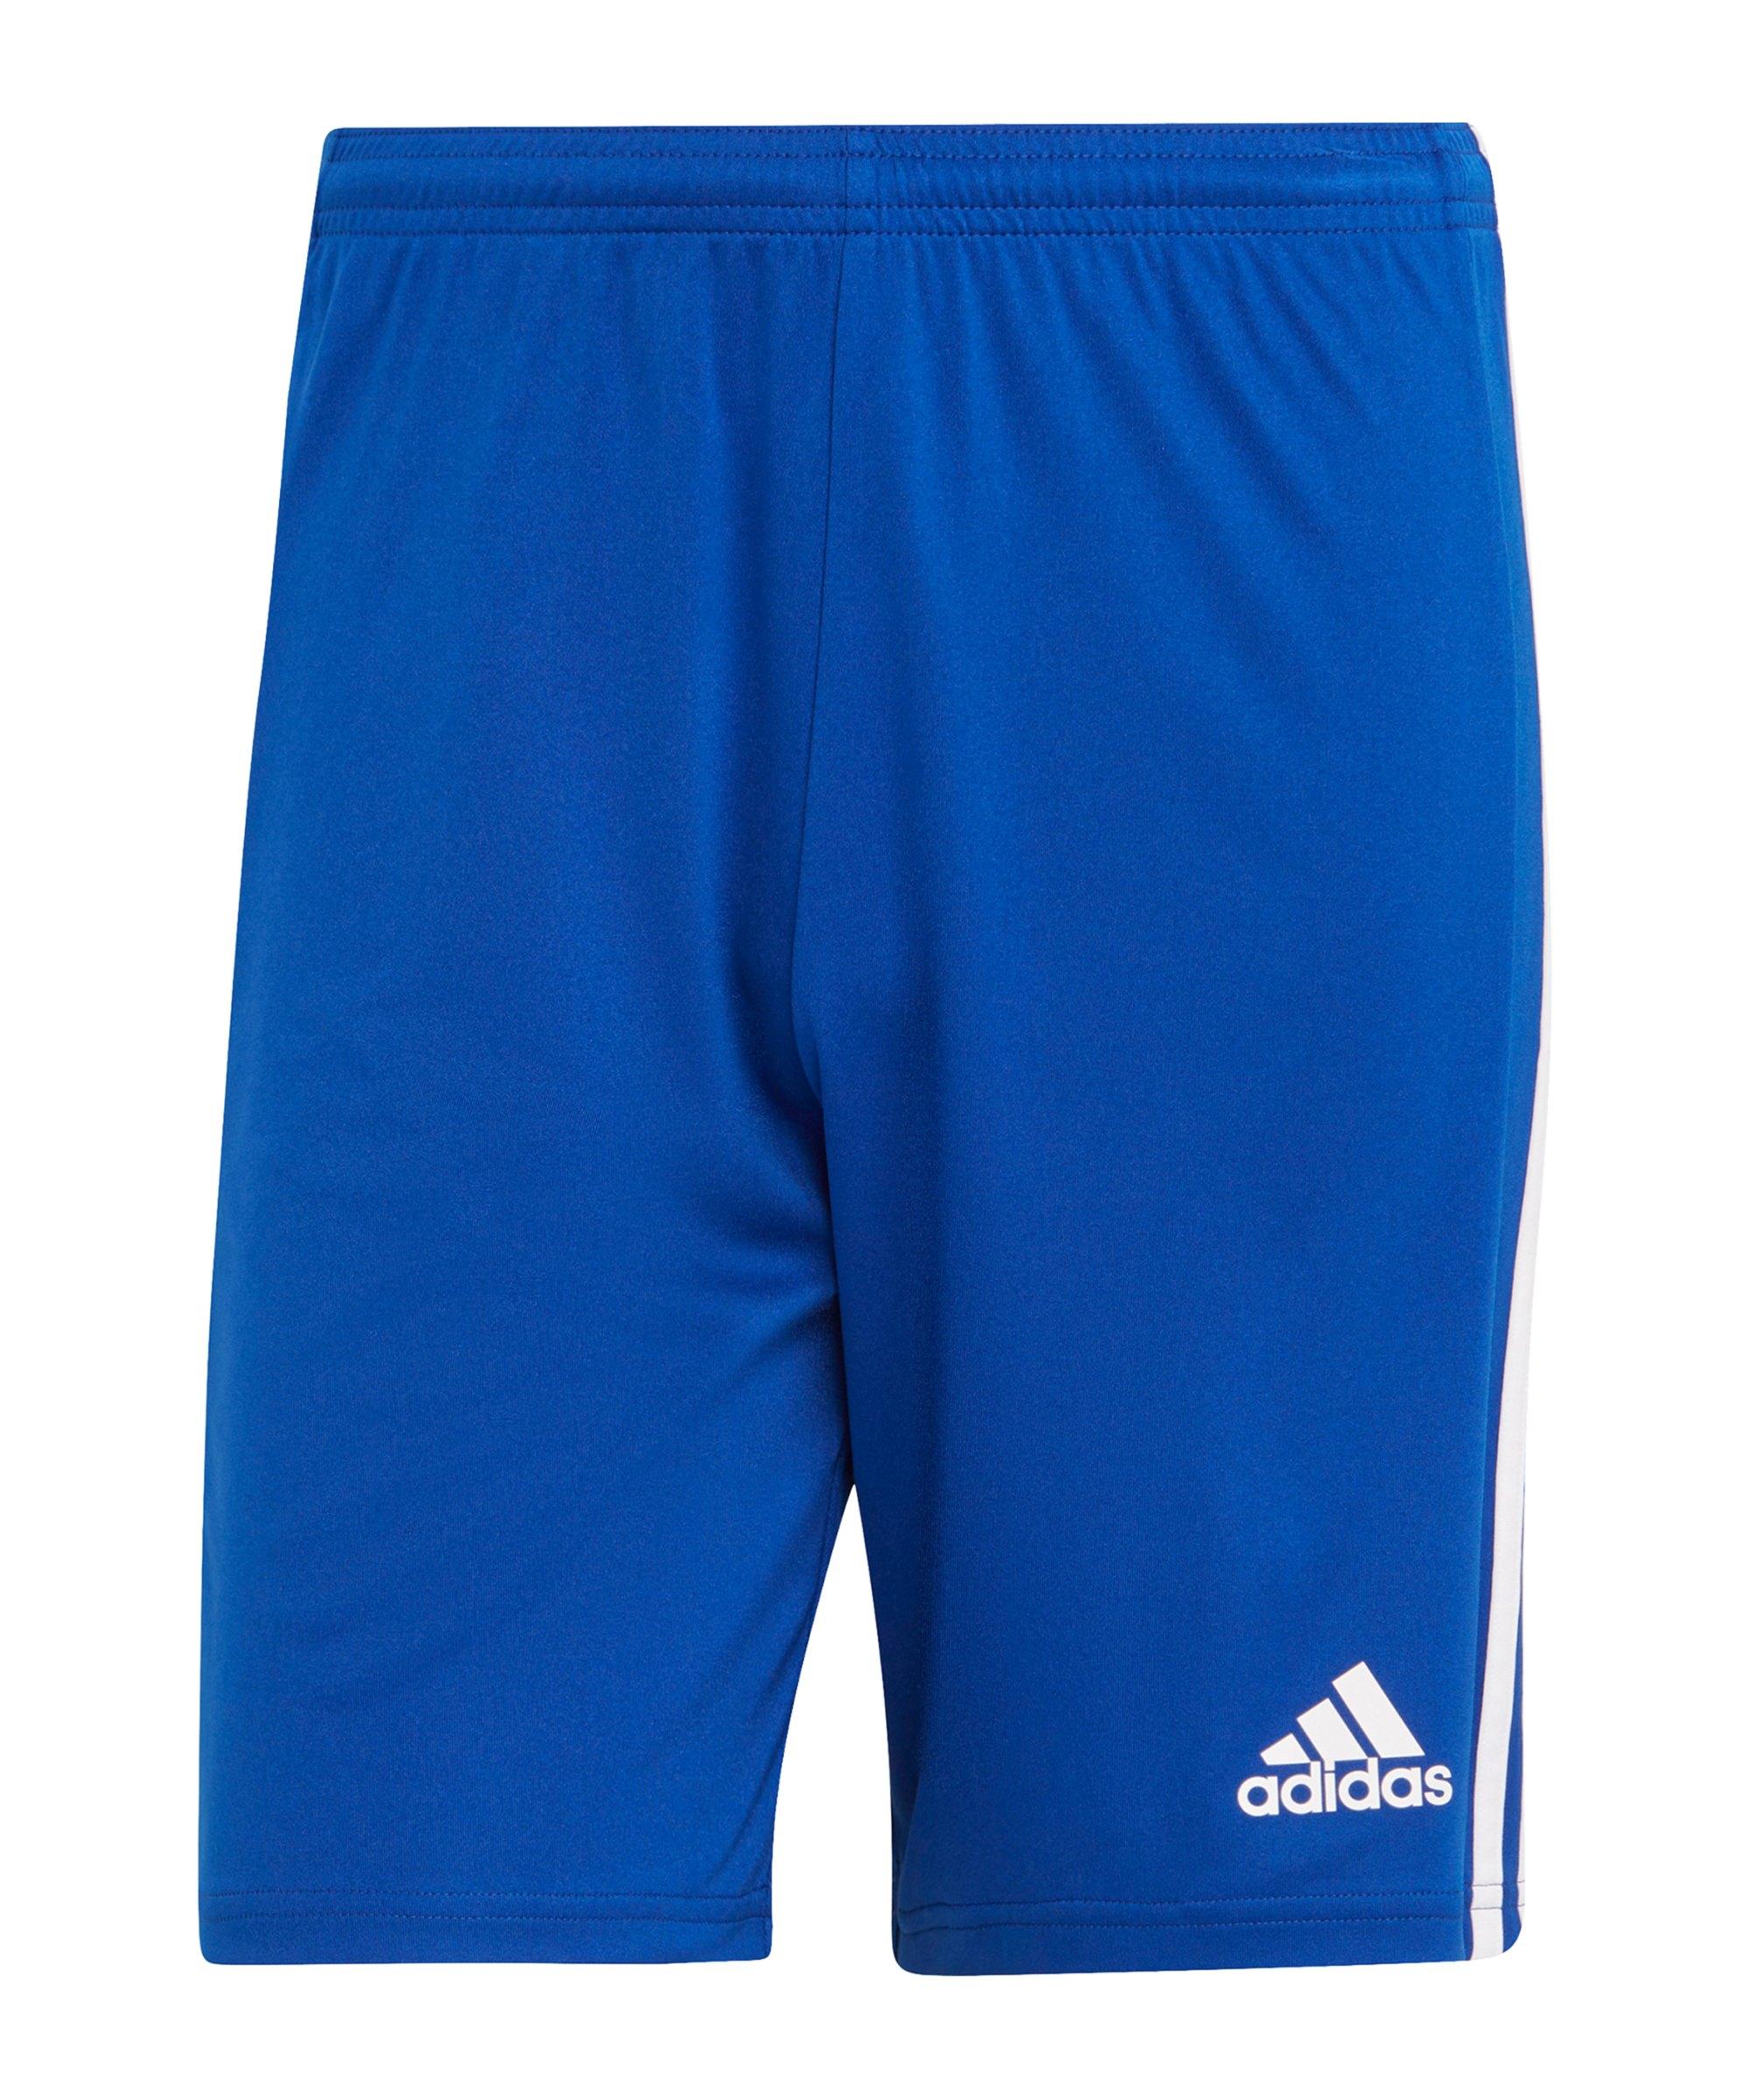 adidas Squadra 21 Short Blau Weiss - blau